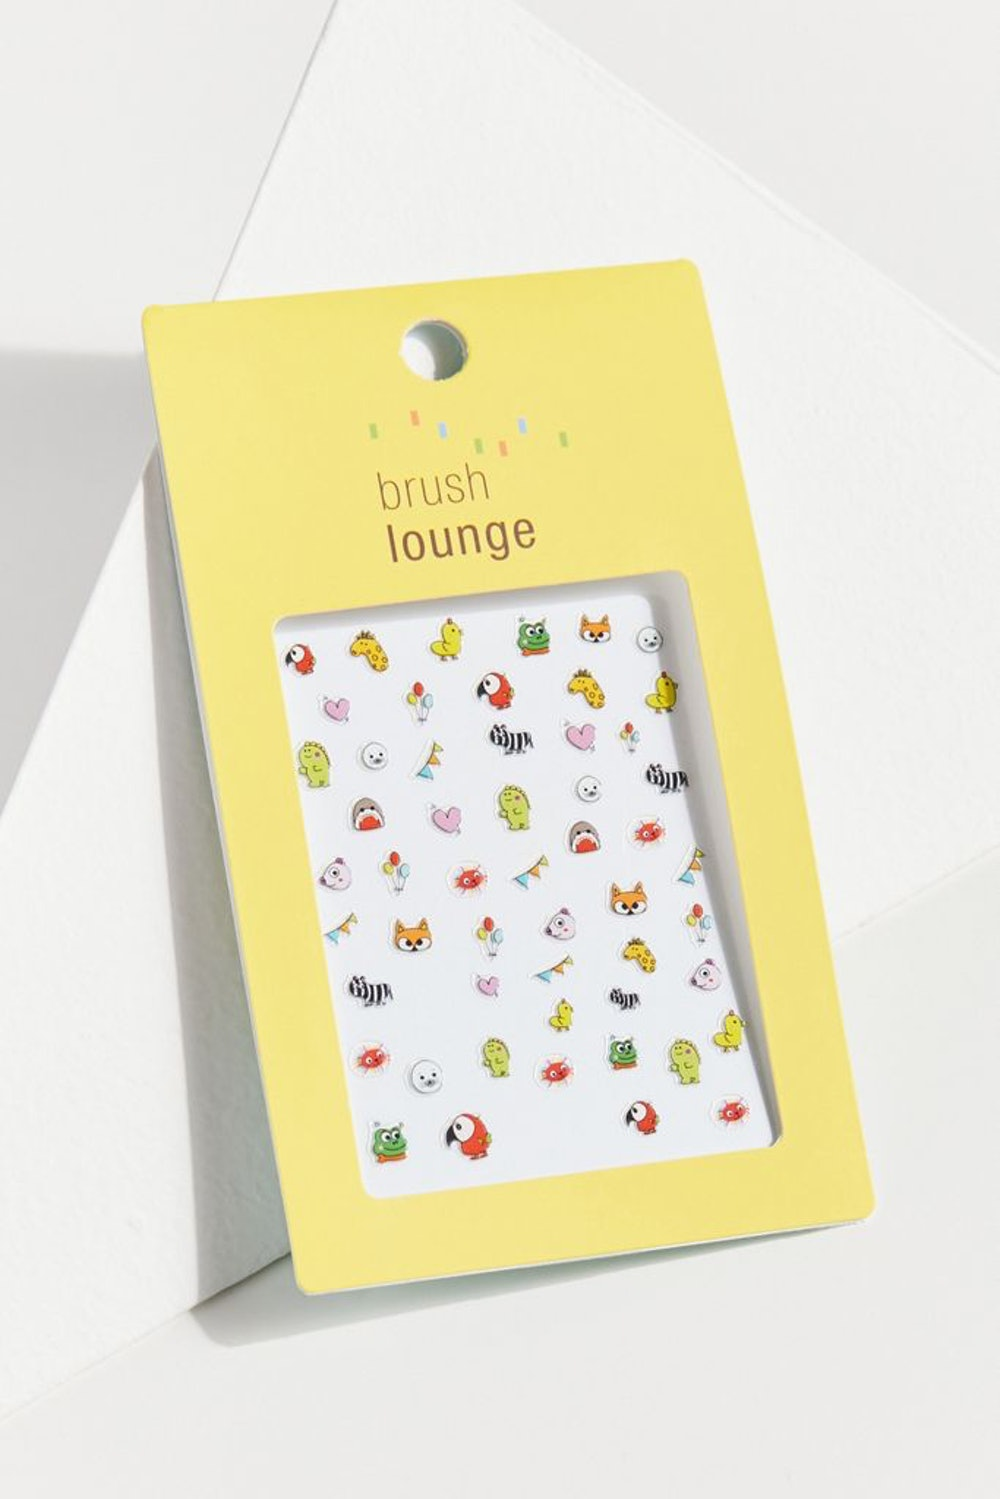 Brush Lounge Nail Stickers